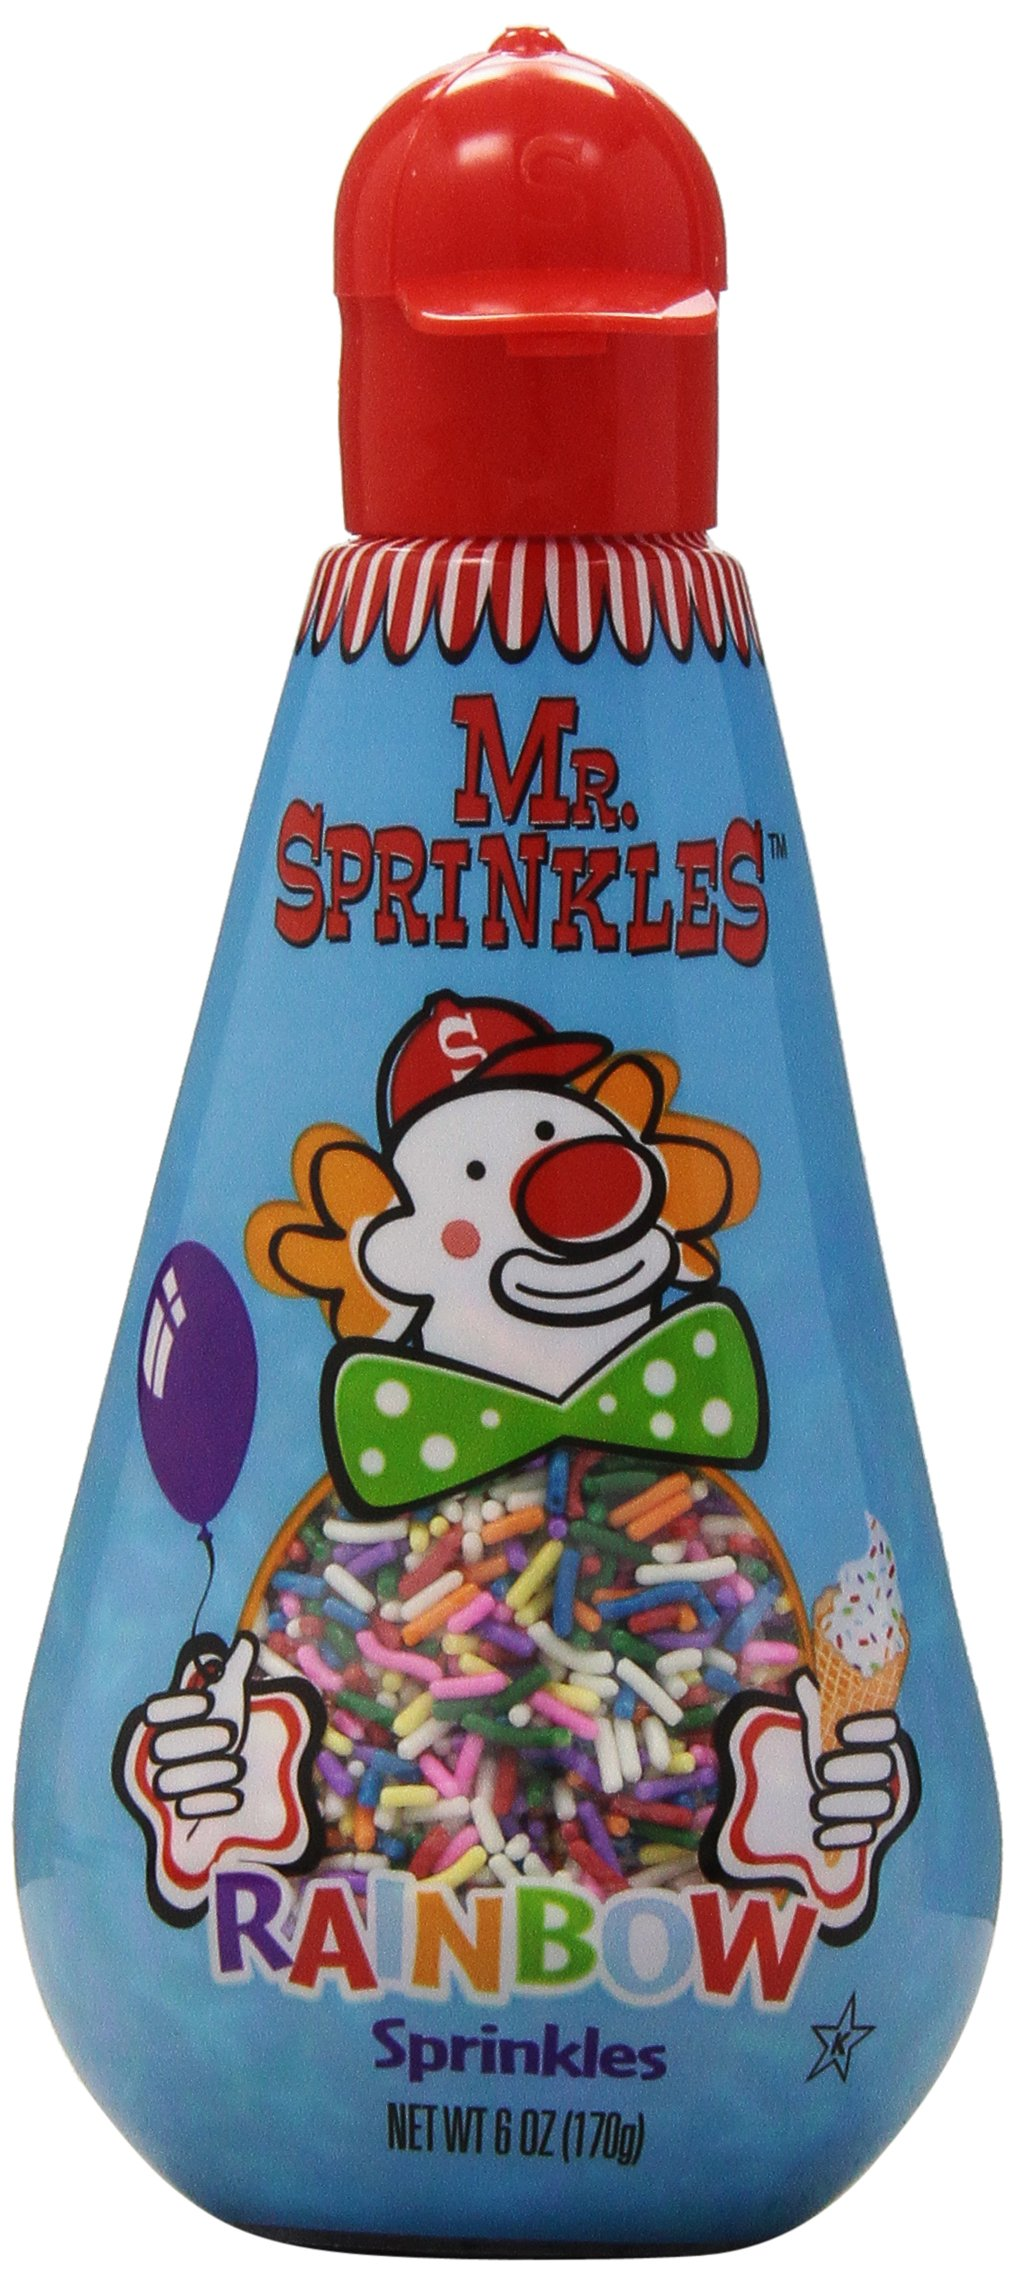 Mr. Sprinkles Rainbow Sprinkles, 6 oz